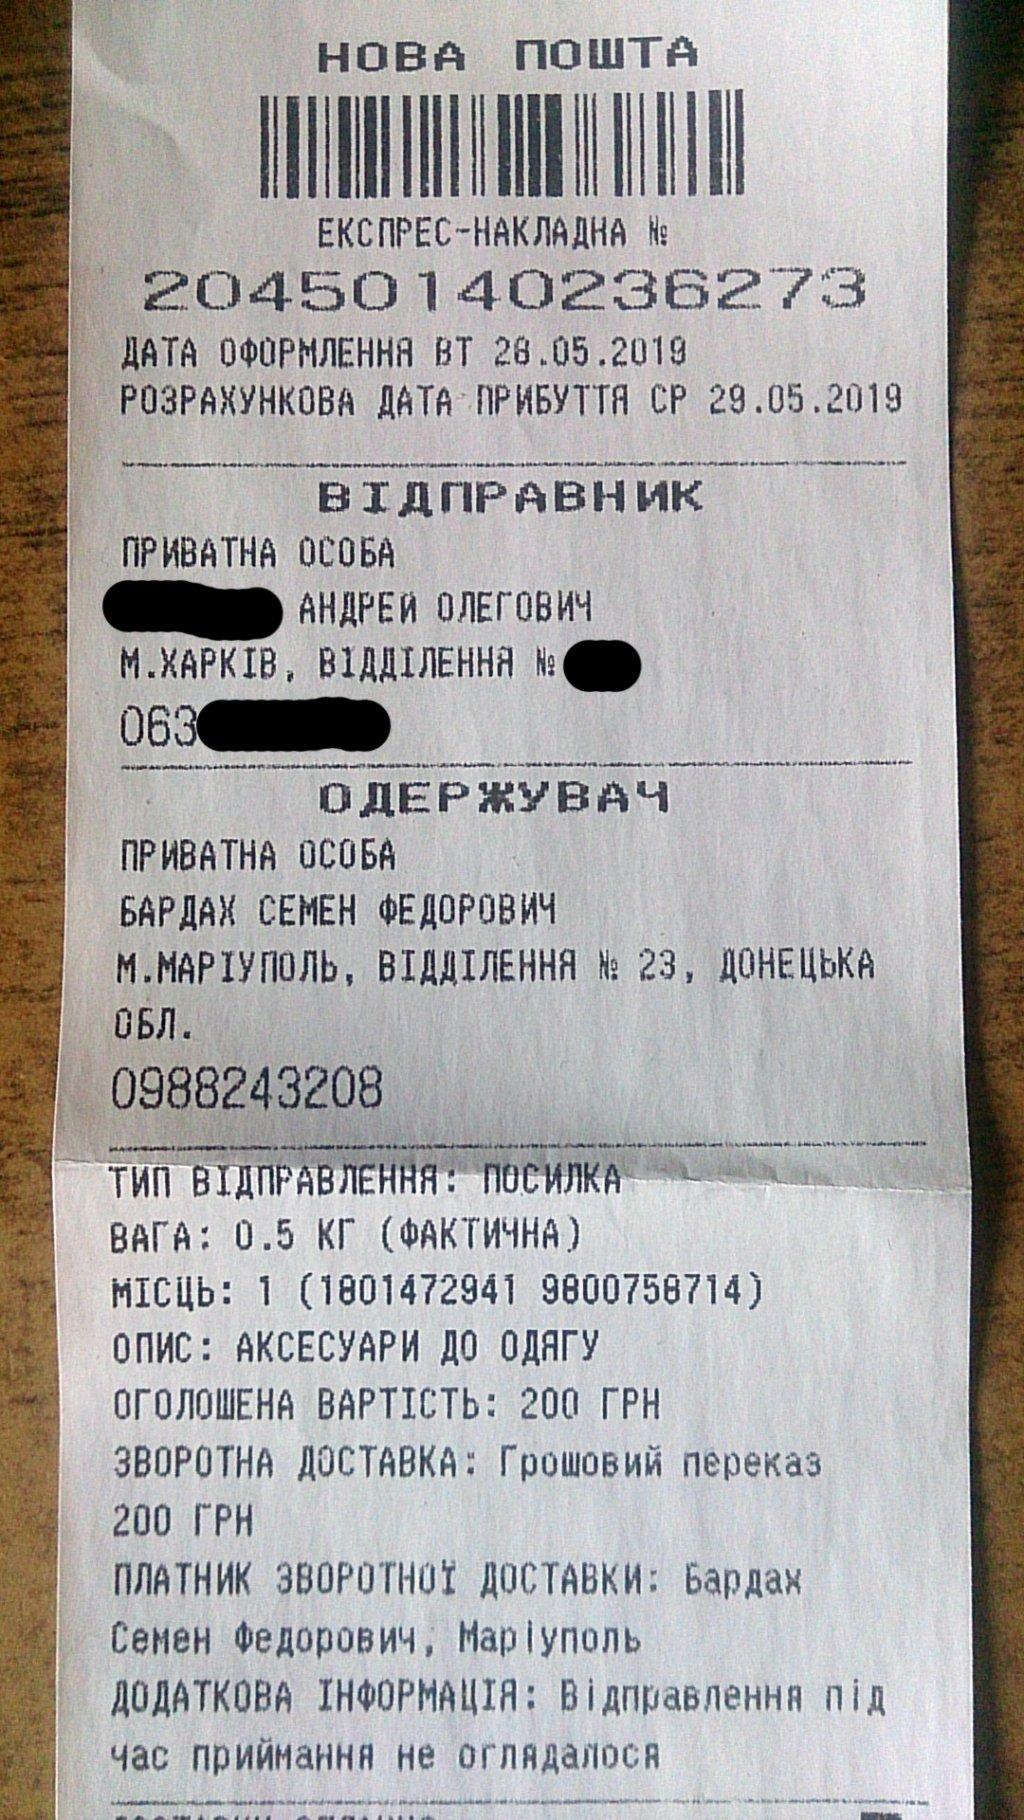 +380988243208 - Полицейский кидало на OLX